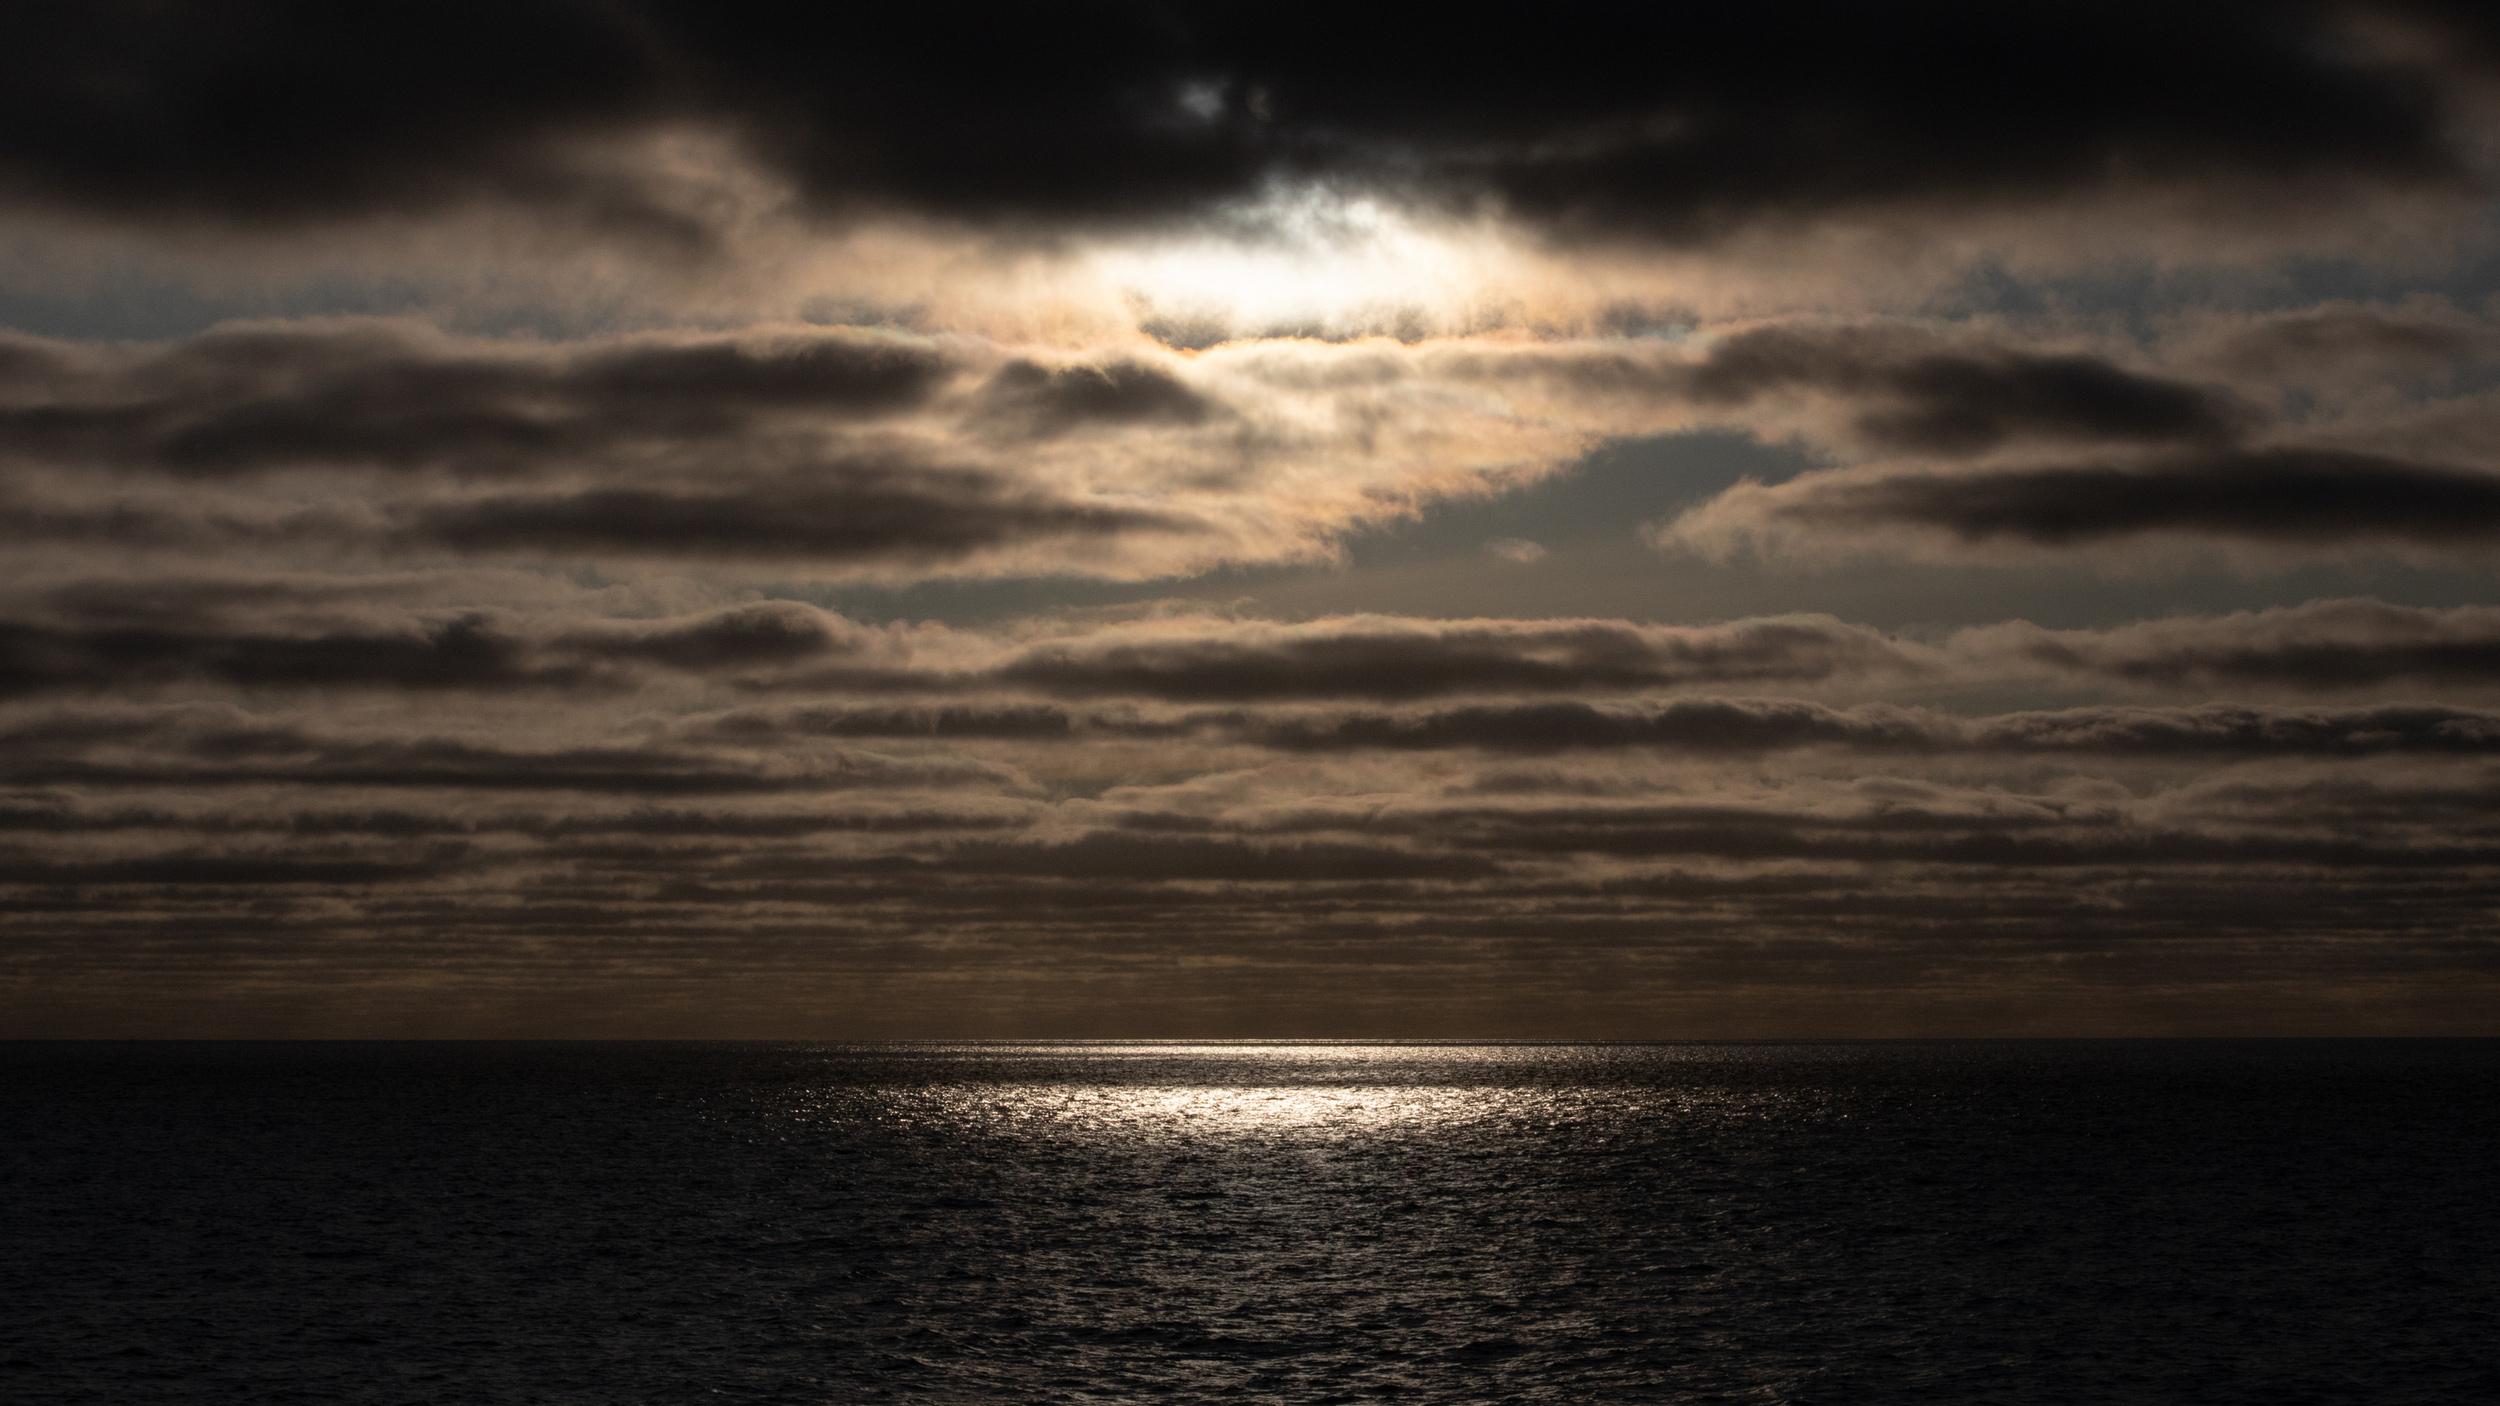 North Sea Dogger Bank Blue Belt bottom trawling